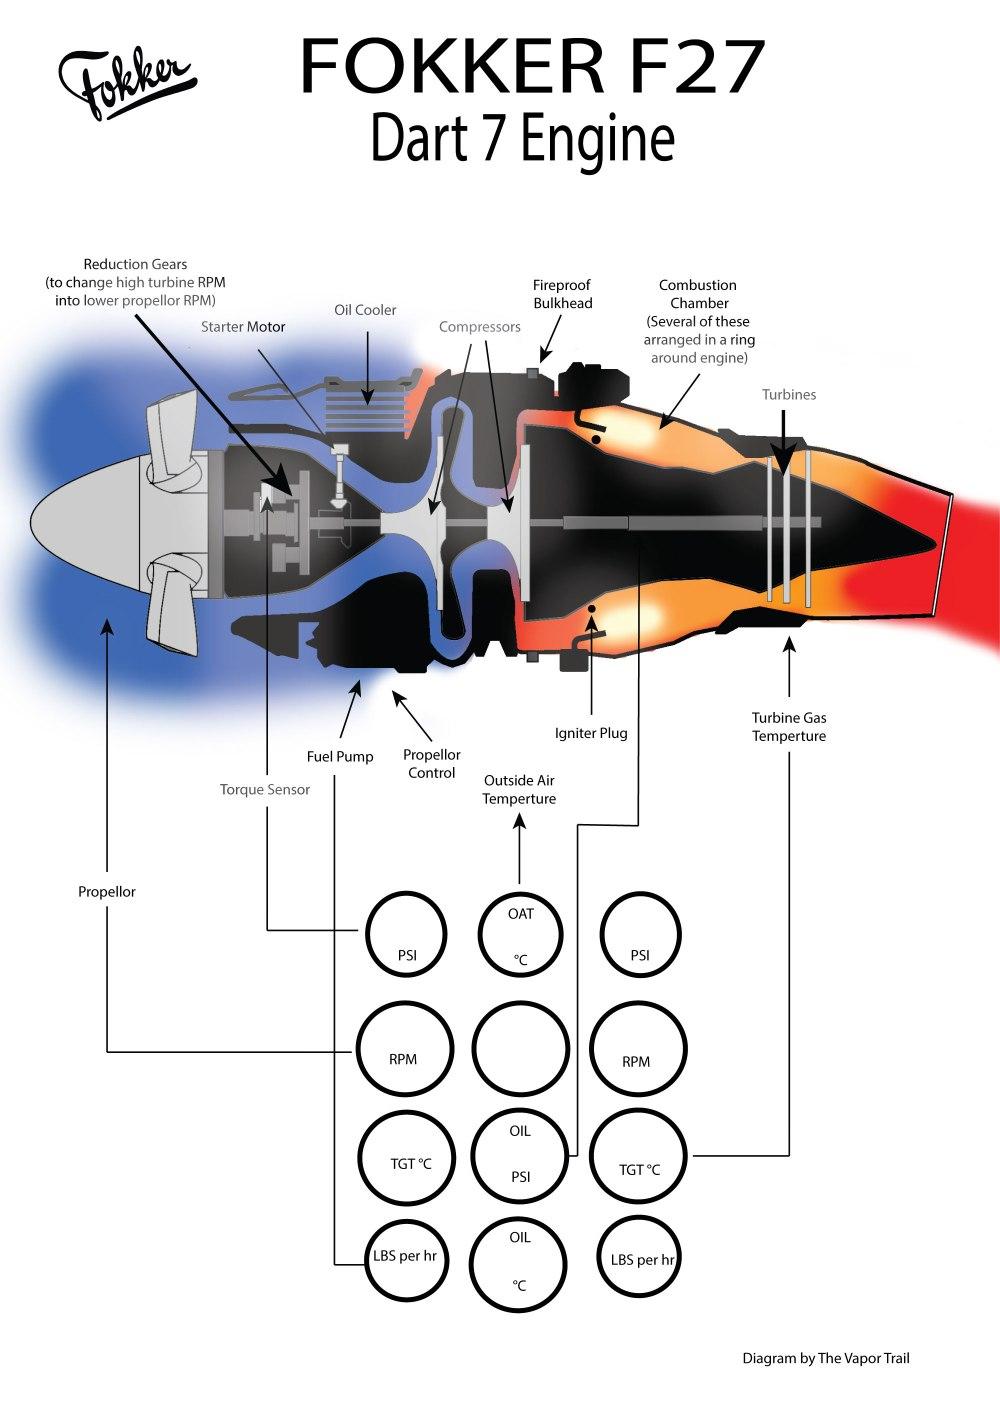 fokker f27 dart 7 engine diagram [ 1000 x 1415 Pixel ]